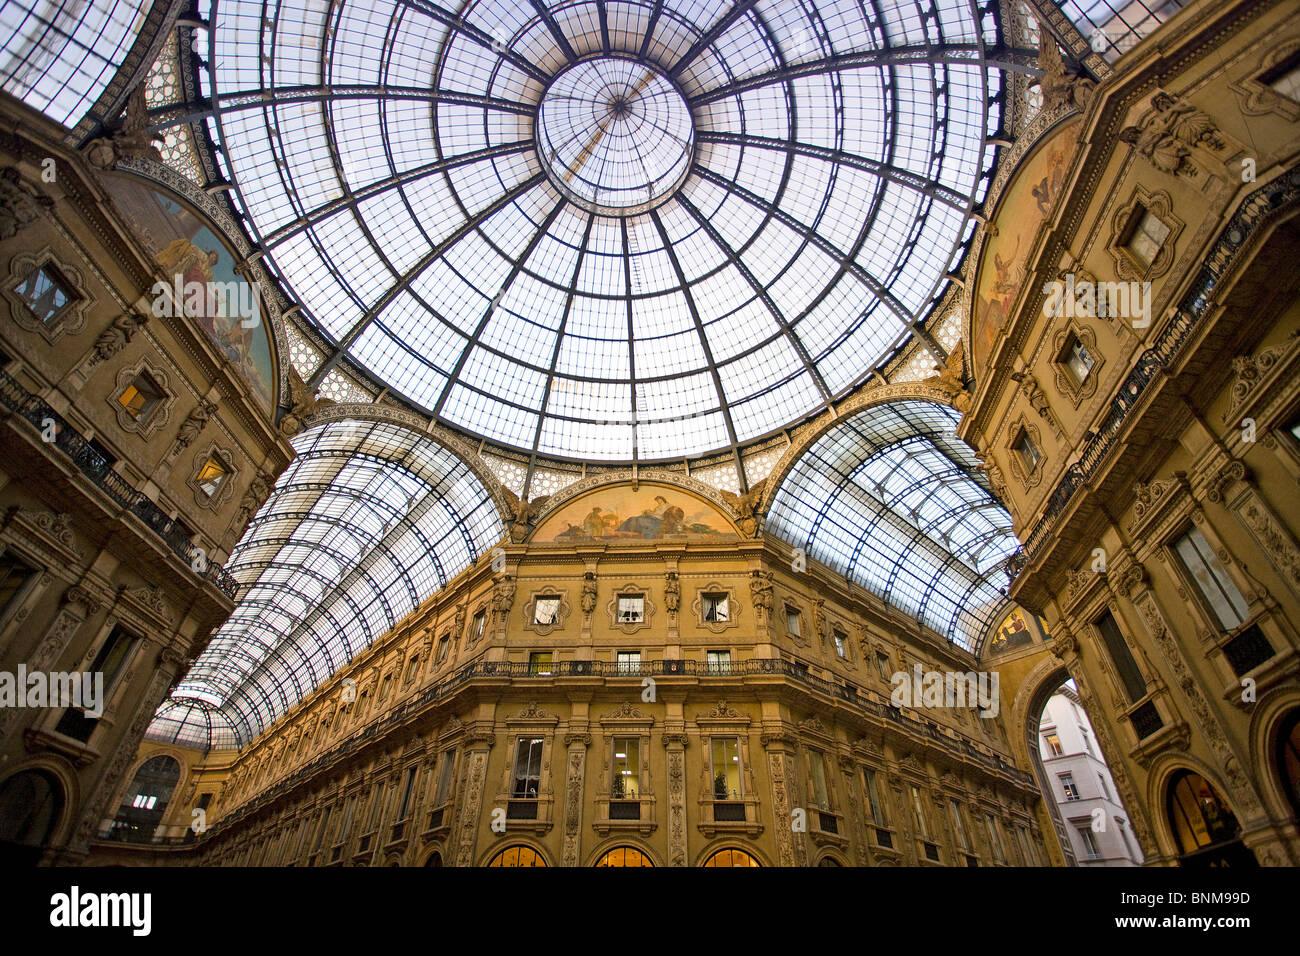 Italy Lombardy Milan Milano Vittorio Emmanuelle Galleria shopping shopping holidays travel, - Stock Image